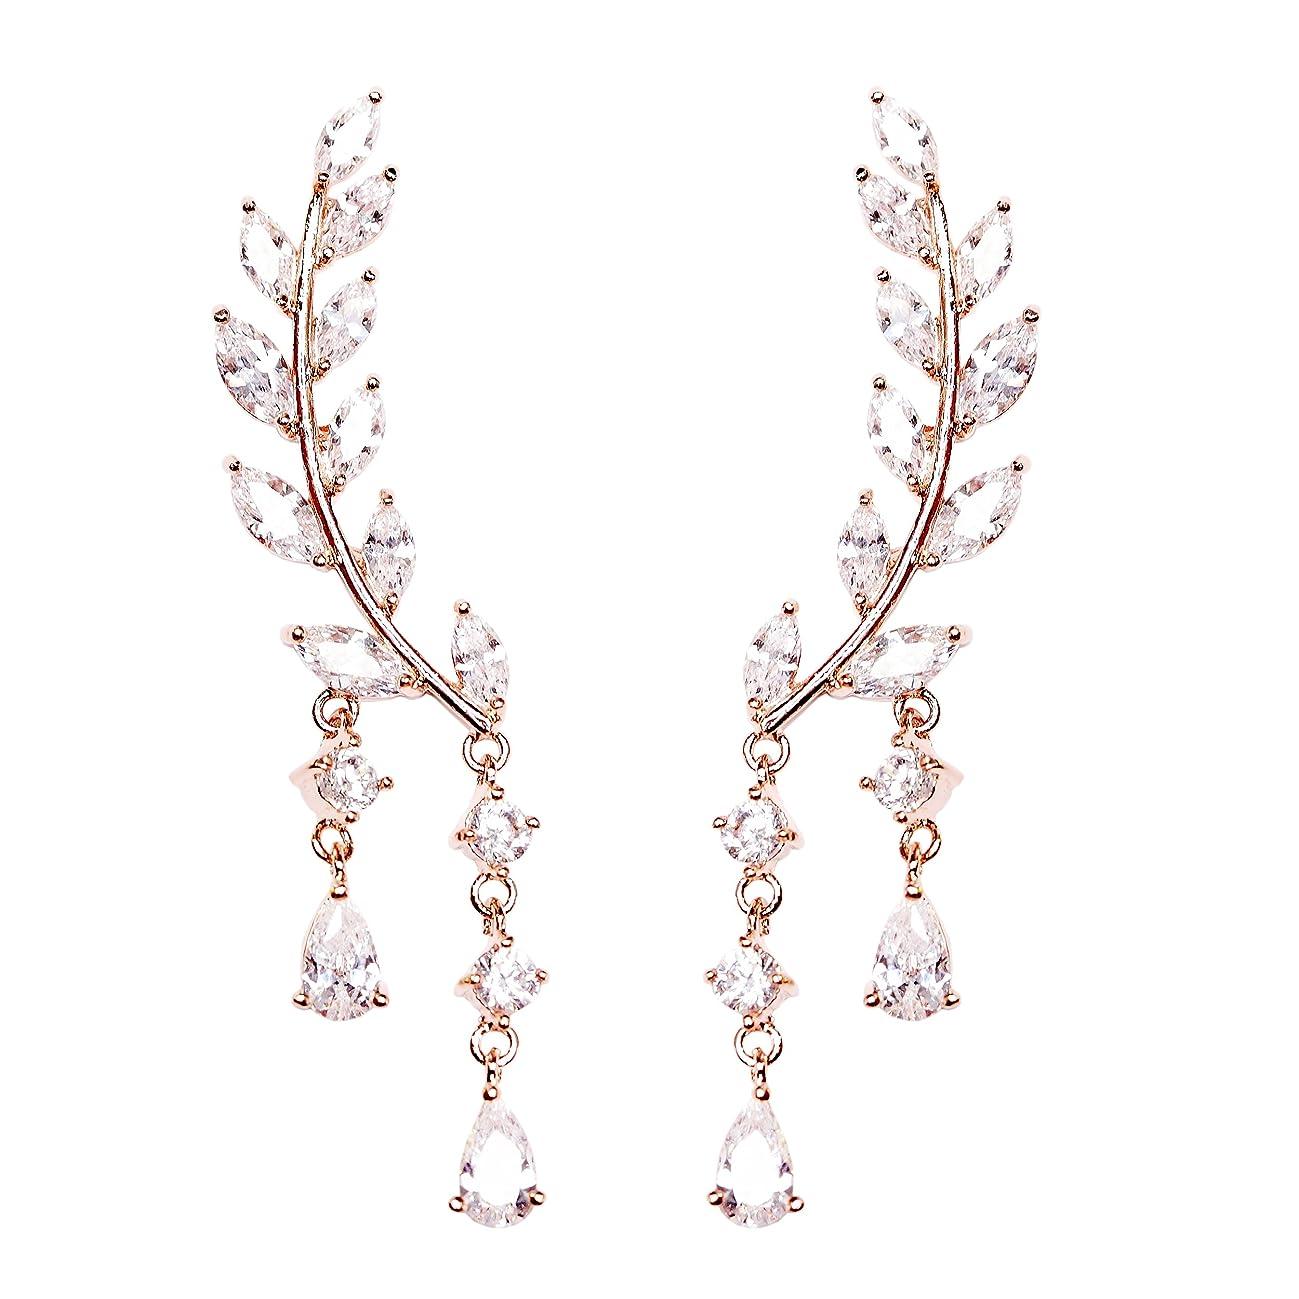 EVERU CZ Vine Jewelry Sweep Wrap Crystal Rose Gold Plated Leaf Ear Cuffs Set Stud Earrings for Women